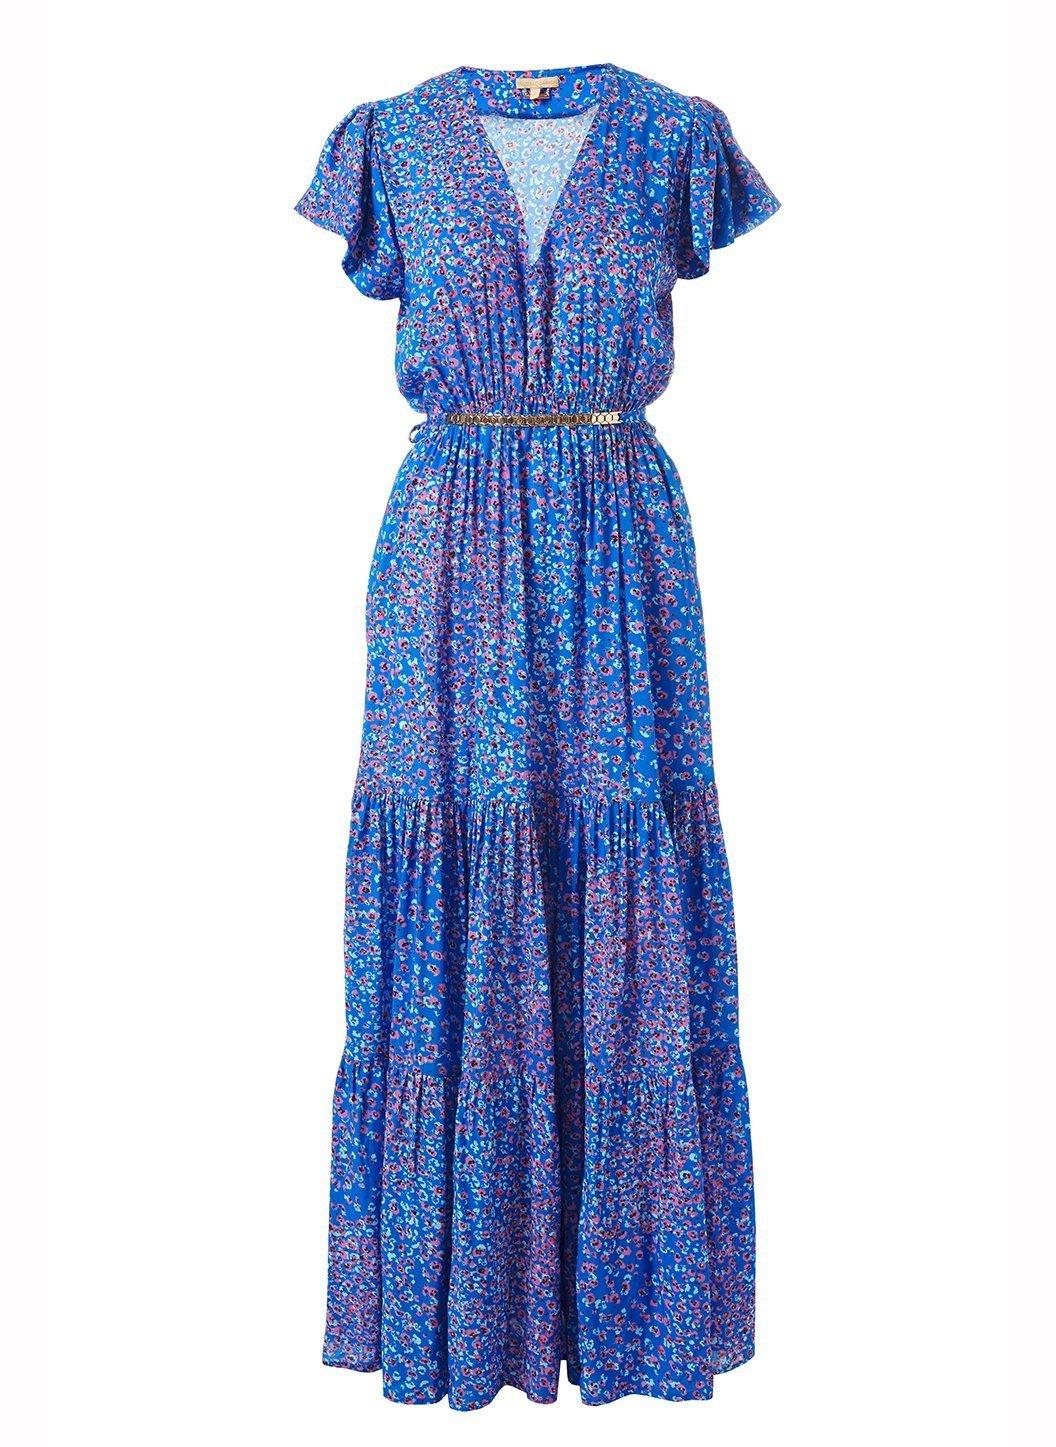 Blue_jay_Petal_Dress_Cutouts_1056x.progressive